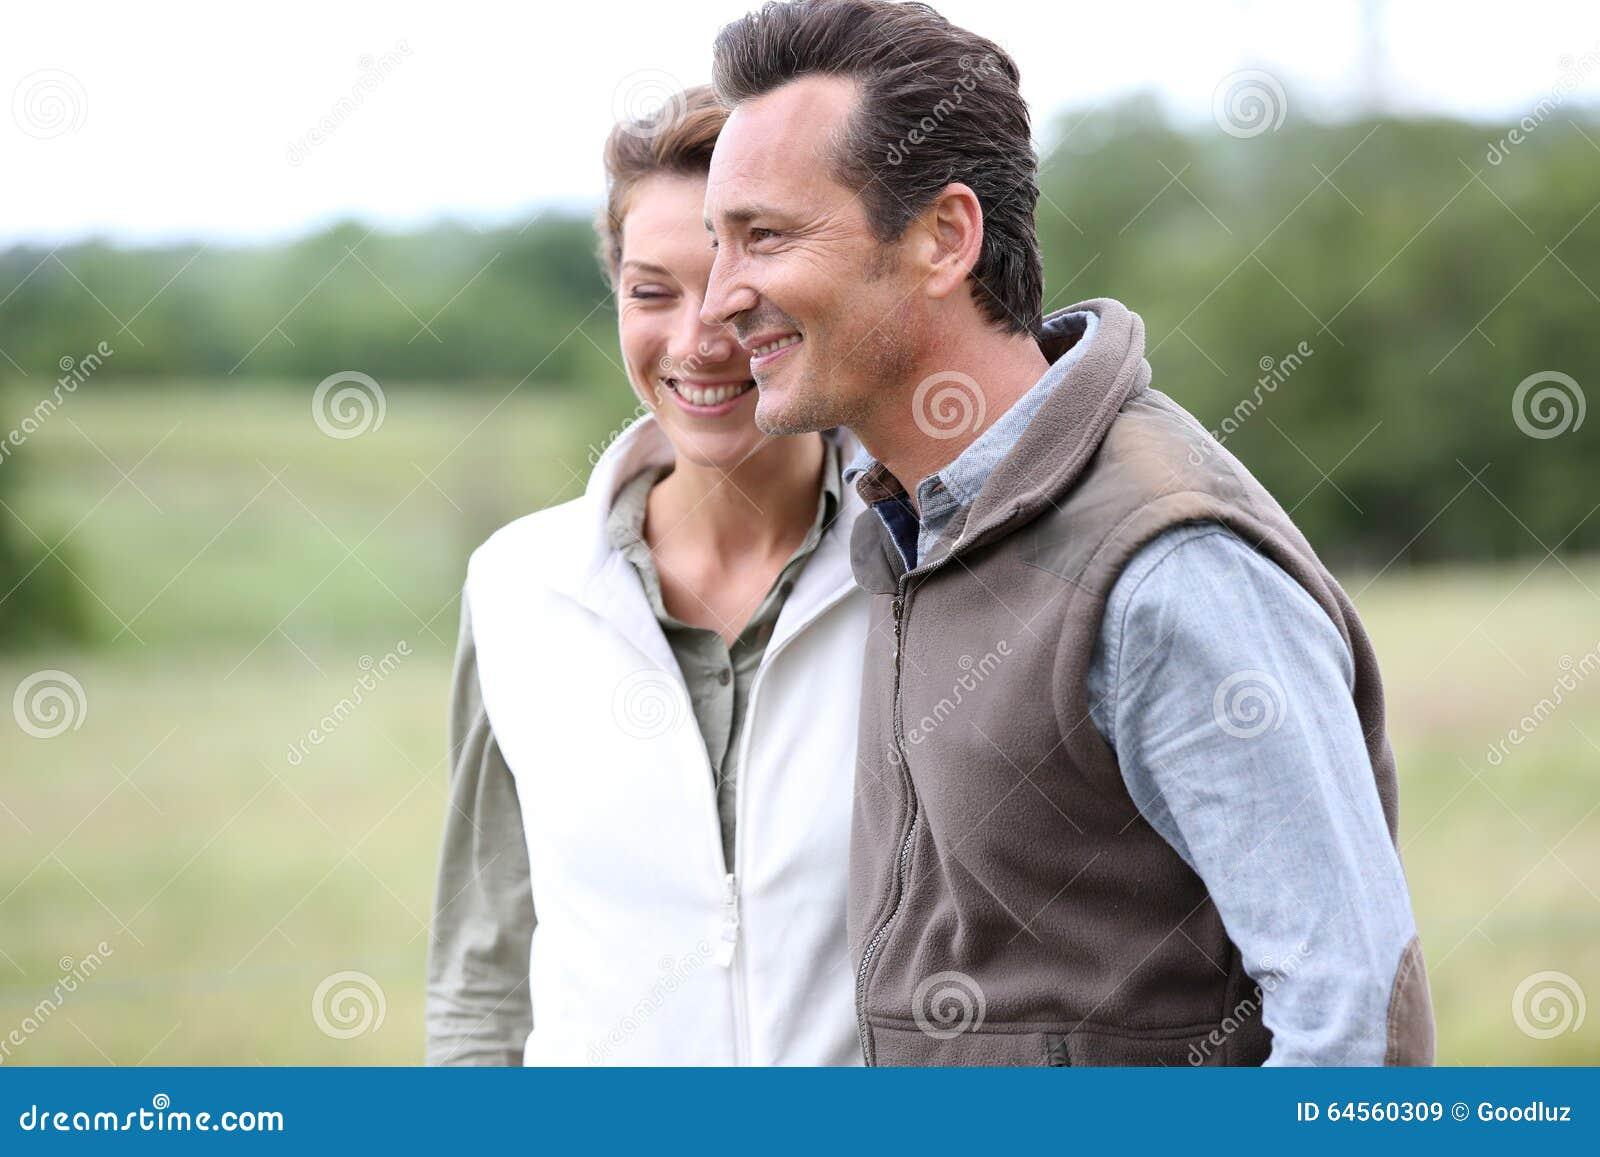 Cheerful couple on countryside walking